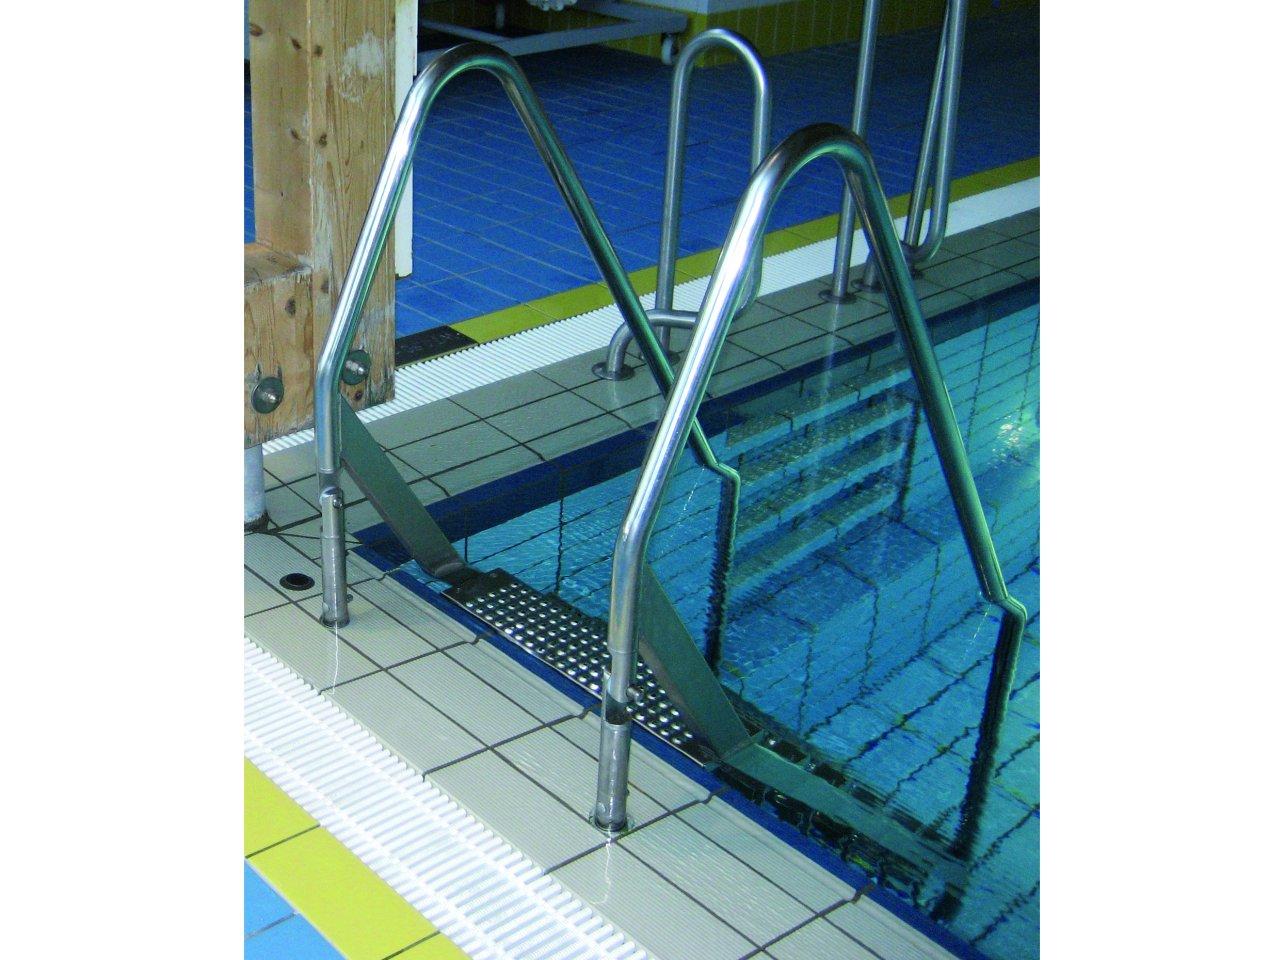 R300 2K Schwimmbadtreppe klappbar I